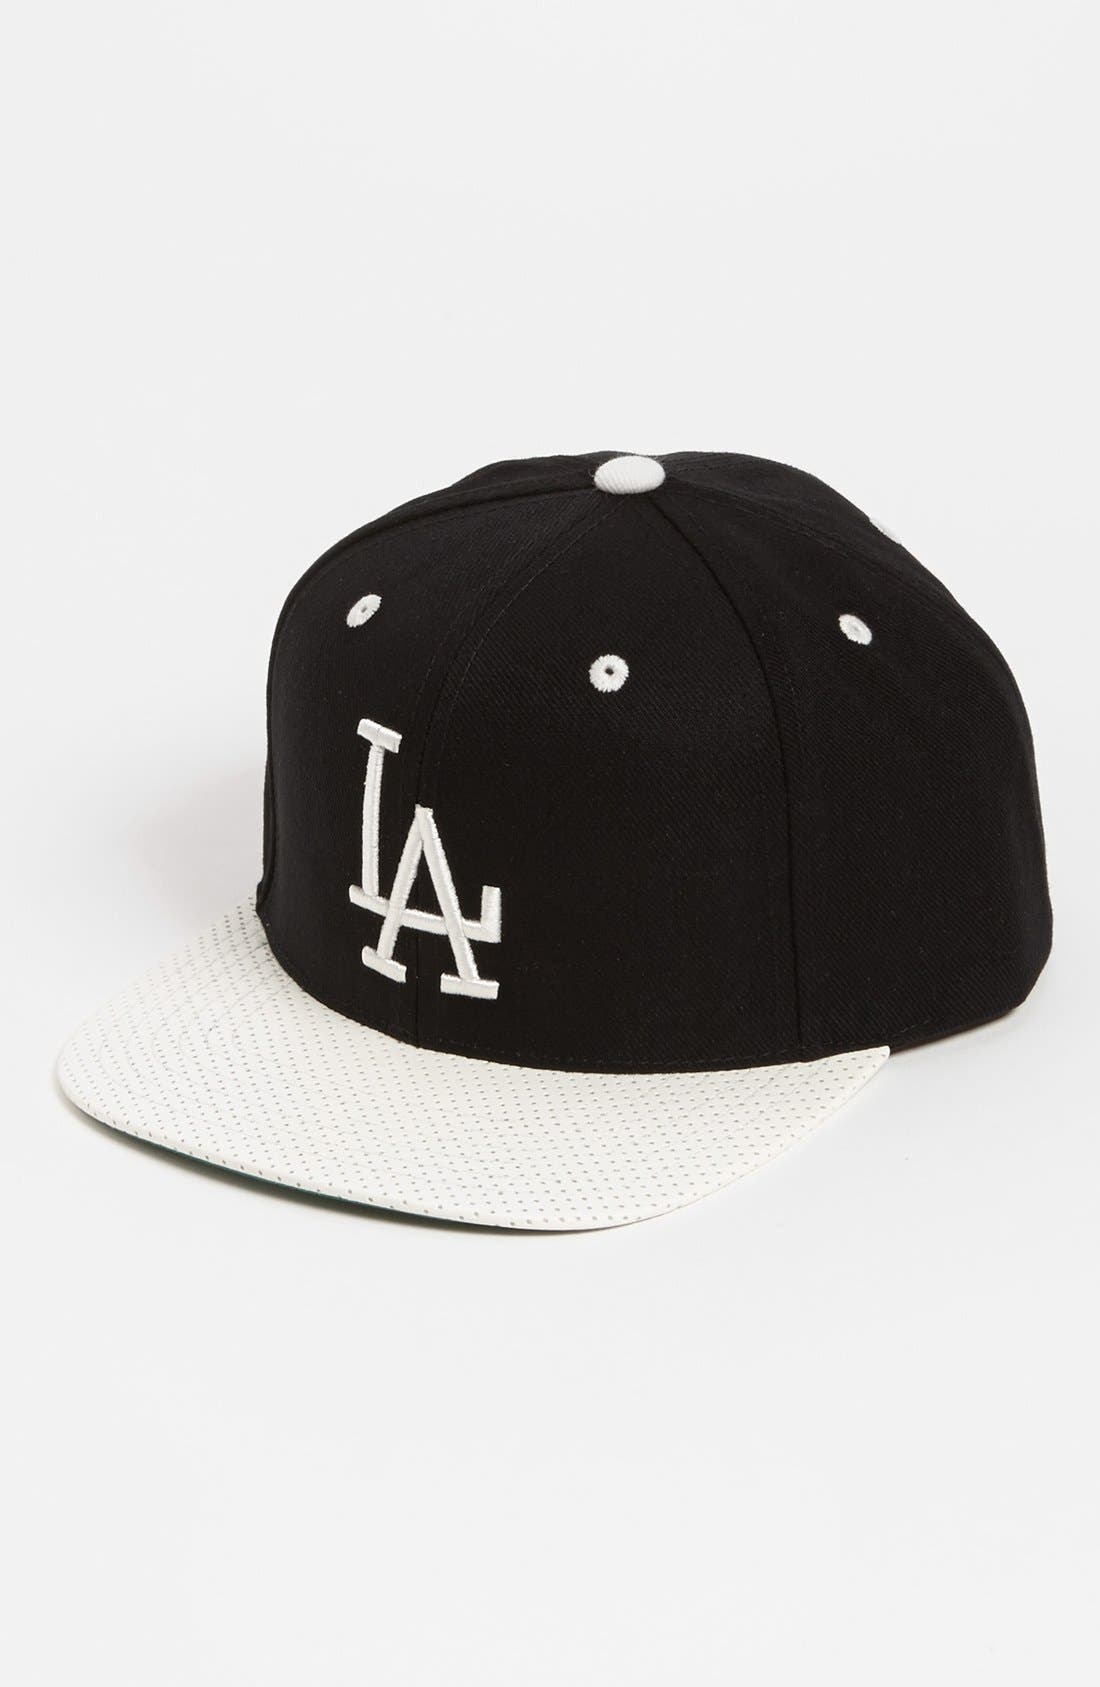 Main Image - American Needle 'Los Angeles Dodgers - The Natural' Snapback Baseball Cap